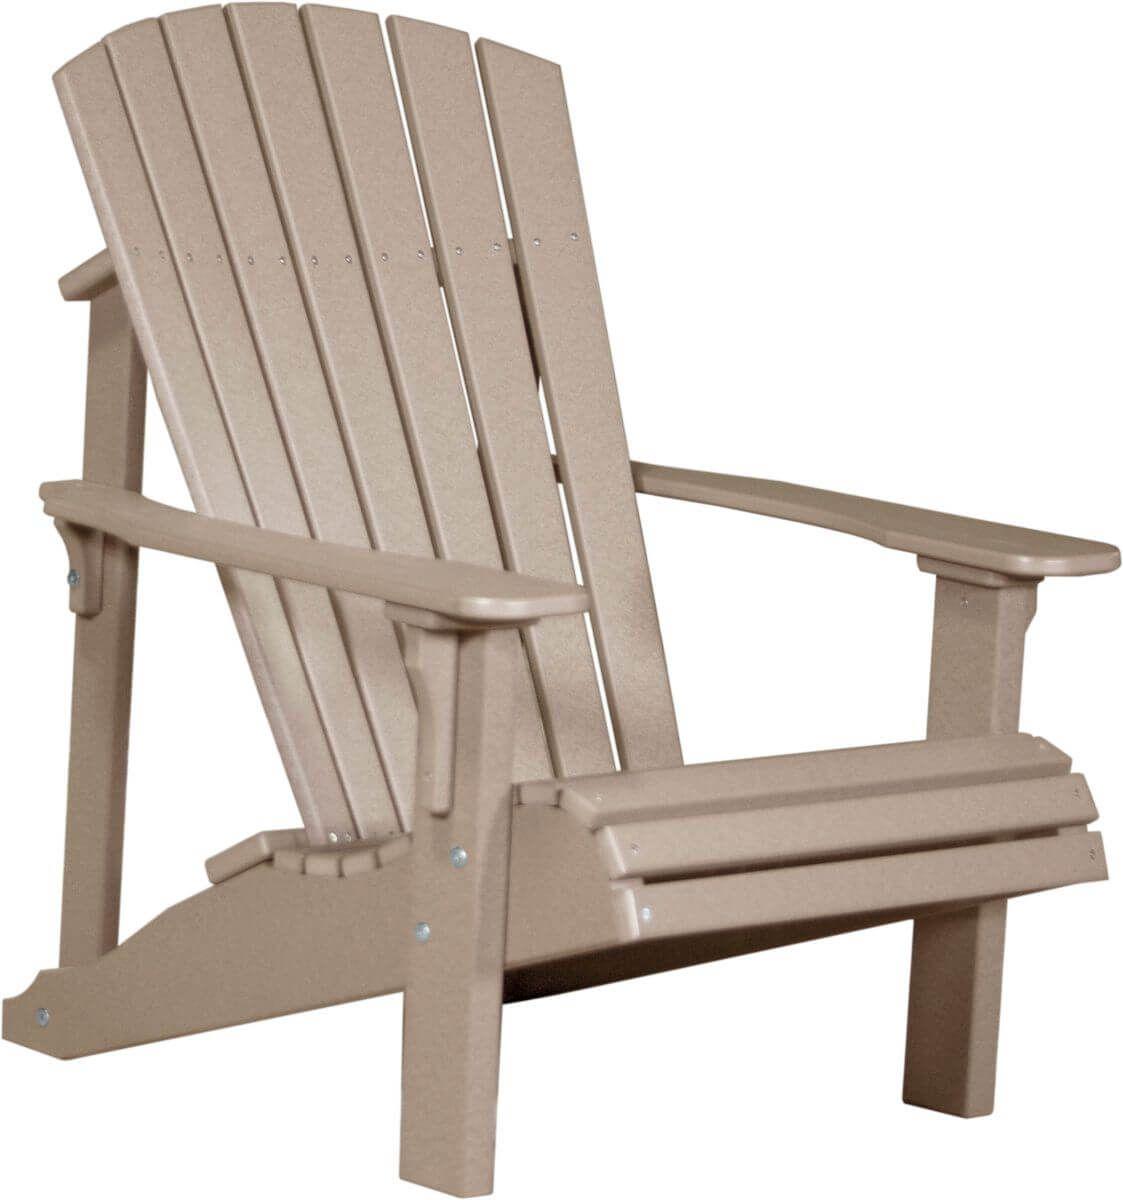 Weatherwood Rockaway Adirondack Chair